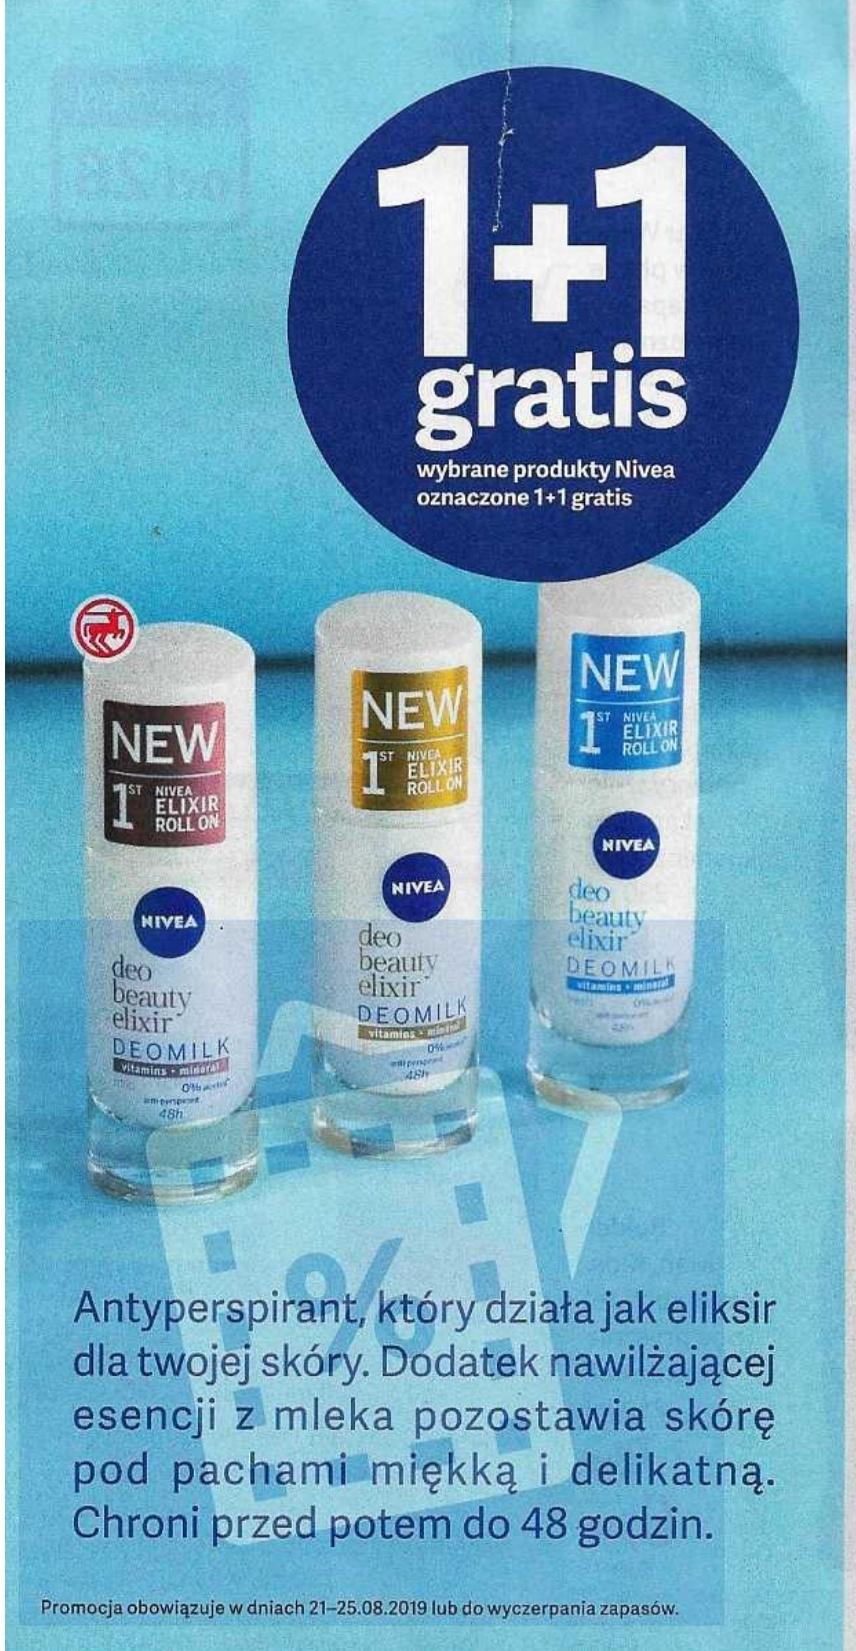 ROSSMANN 1+1 gratis na wybrane produkty Nivea 21.08.-25.08.